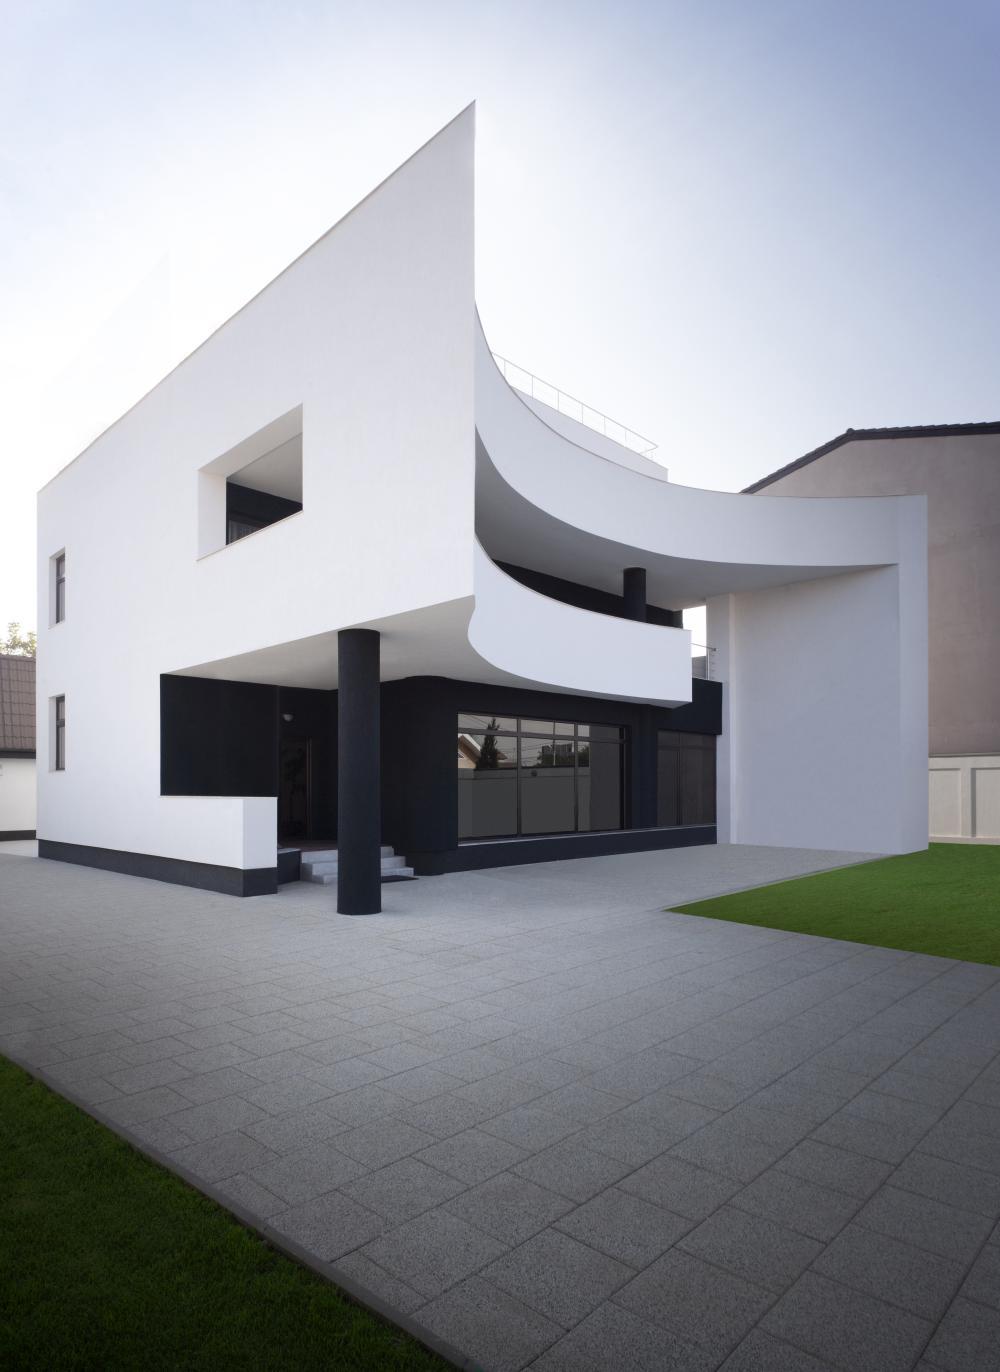 https://nbc-arhitect.ro/wp-content/uploads/2020/11/NBC-ARHITECT-_-residential-_-Mumuleanu-House_1.jpg